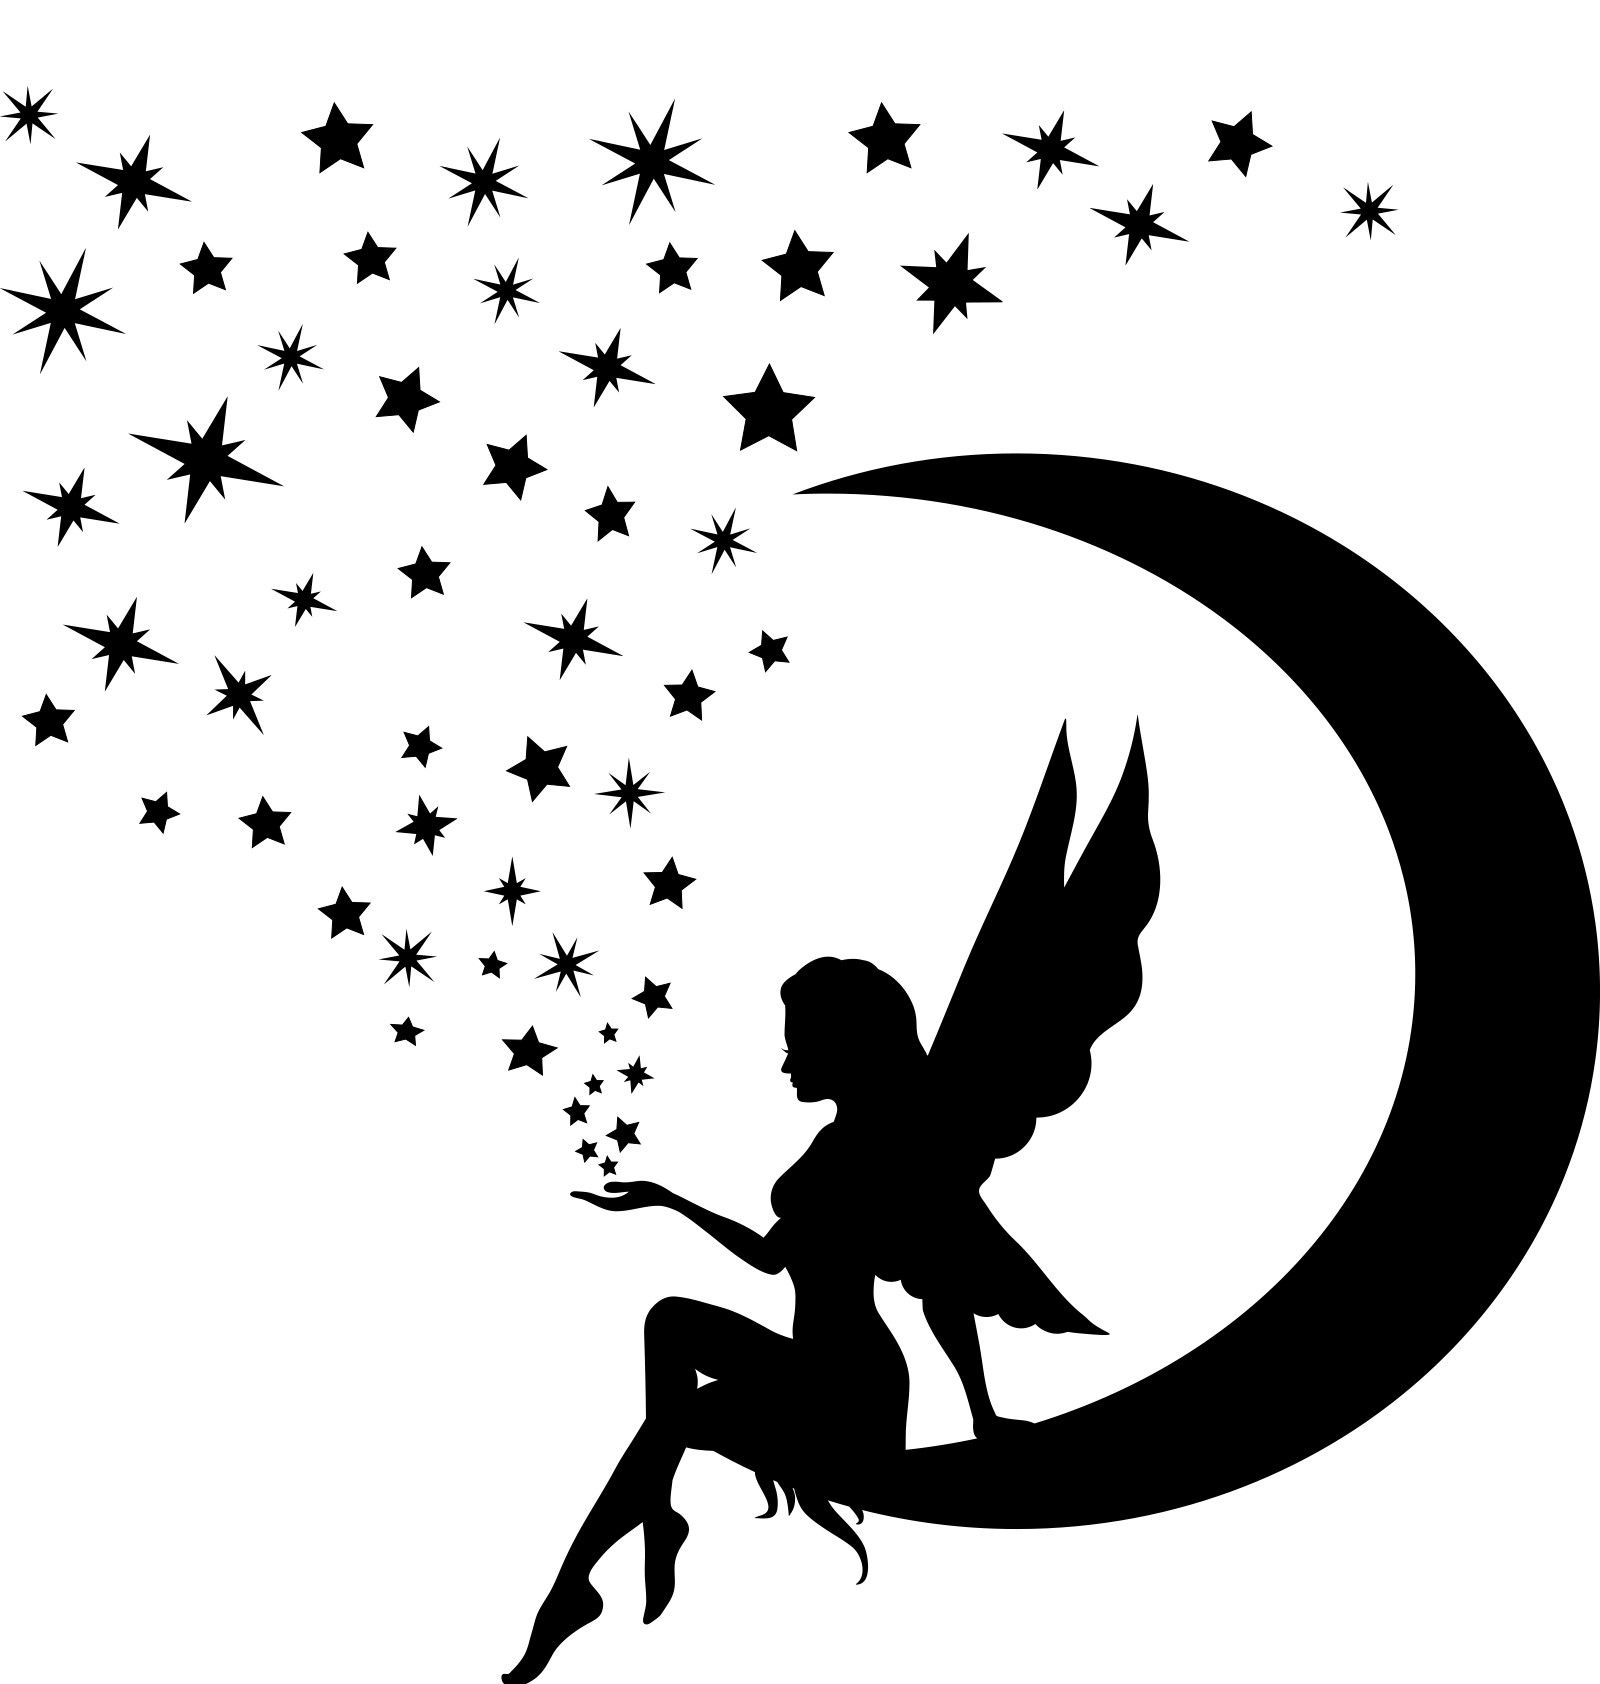 Thatvinylplace Com Media Catalog Product Cache 1 Image 9df78eab33525d08d6e5fb8d27136e95 I M Image Image Blac Fairy Tattoo Designs Fairy Tattoo Fairy Silhouette